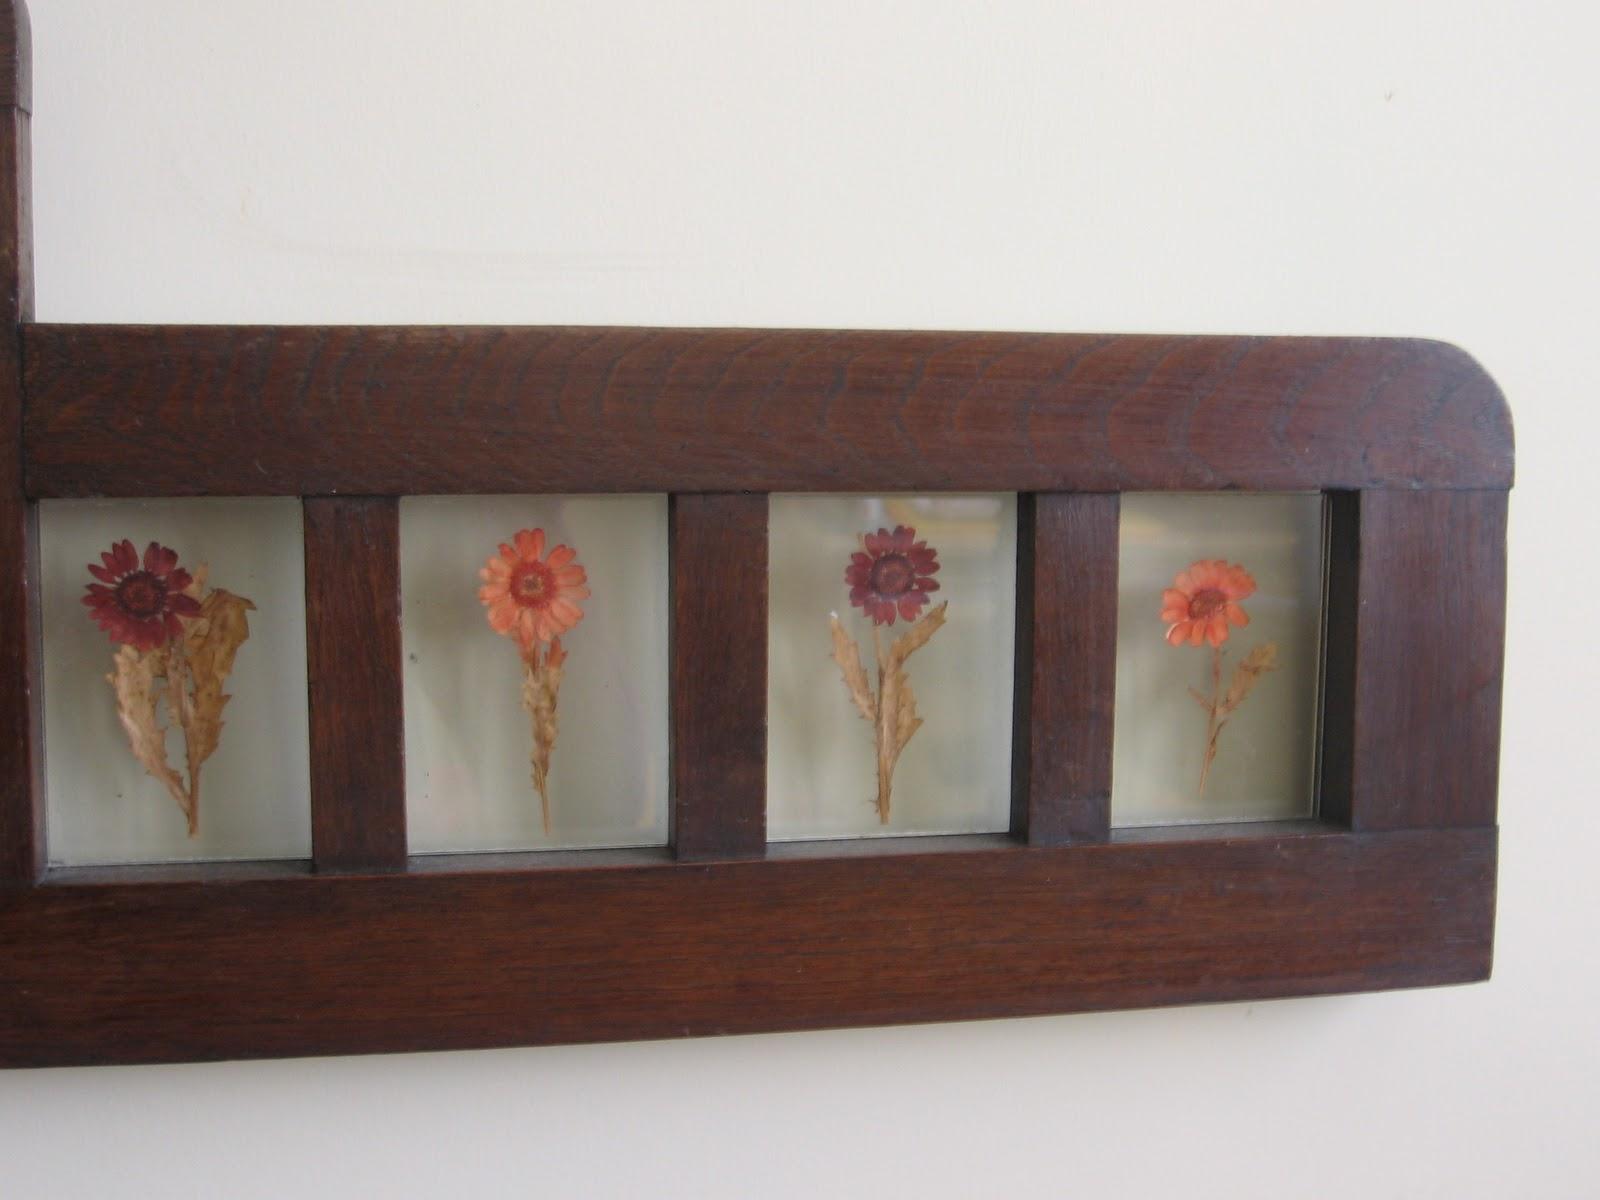 Elrincondelasmilcositas flores secas - Cuadros cabecera cama ...